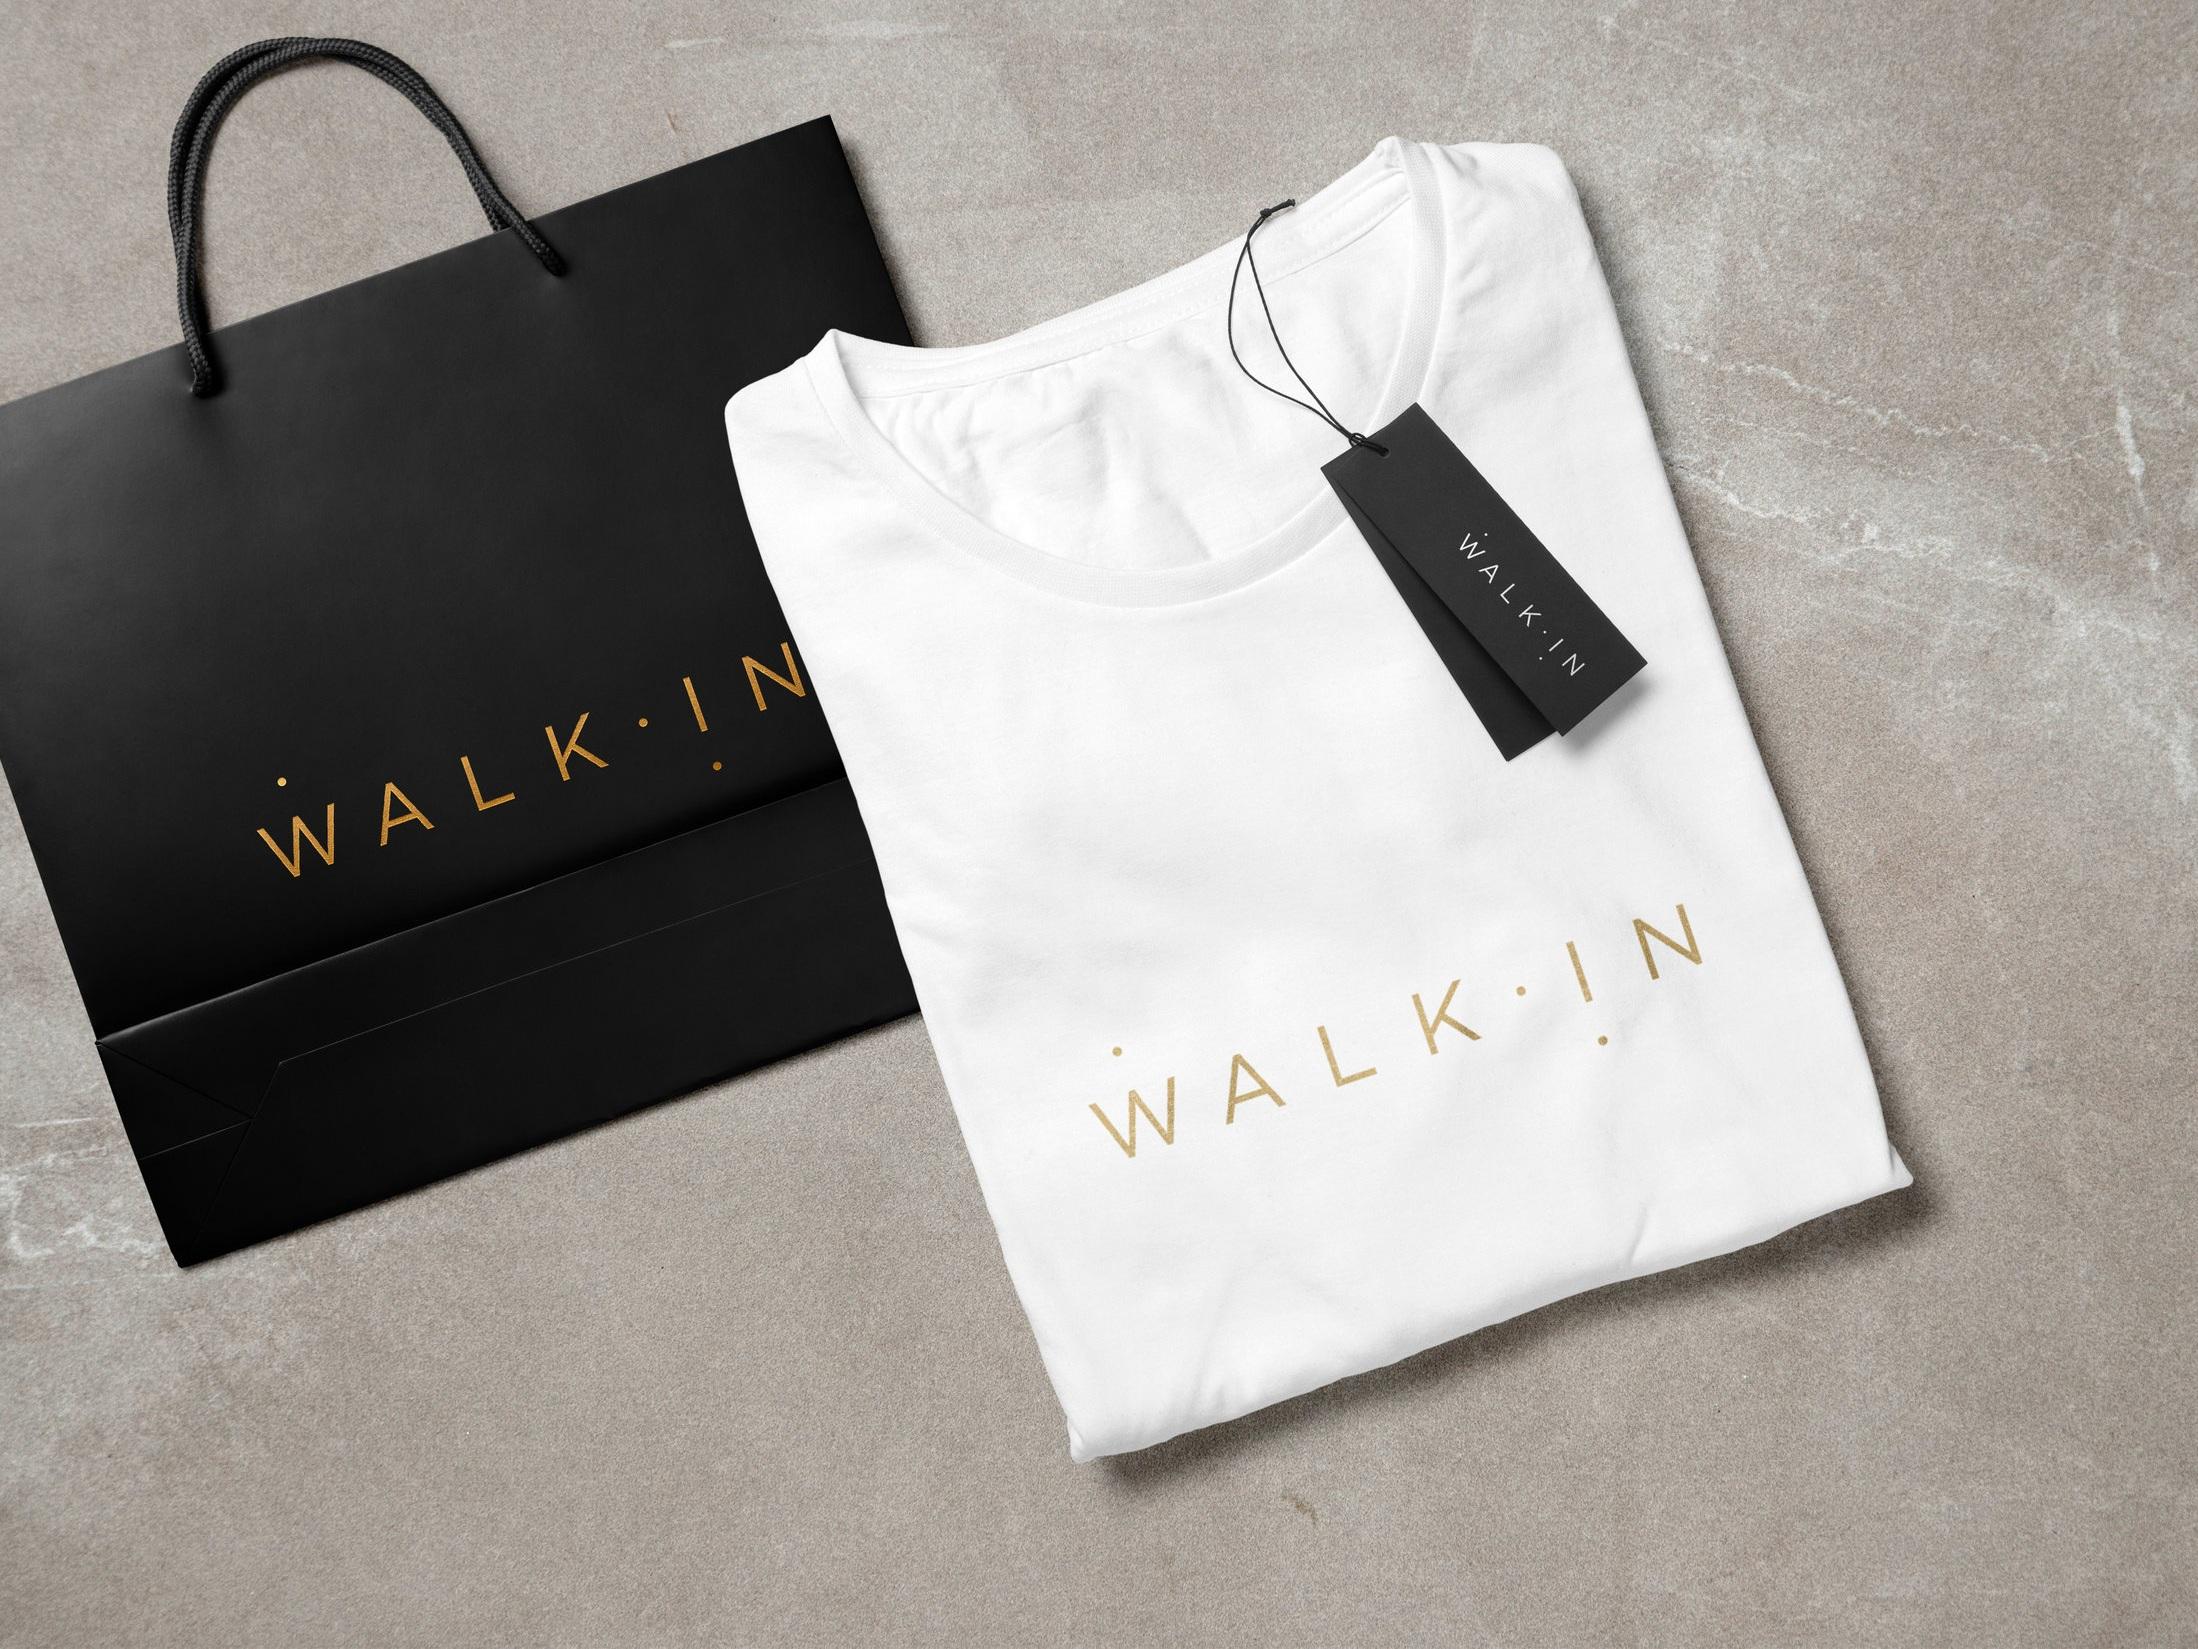 The Walk In Label